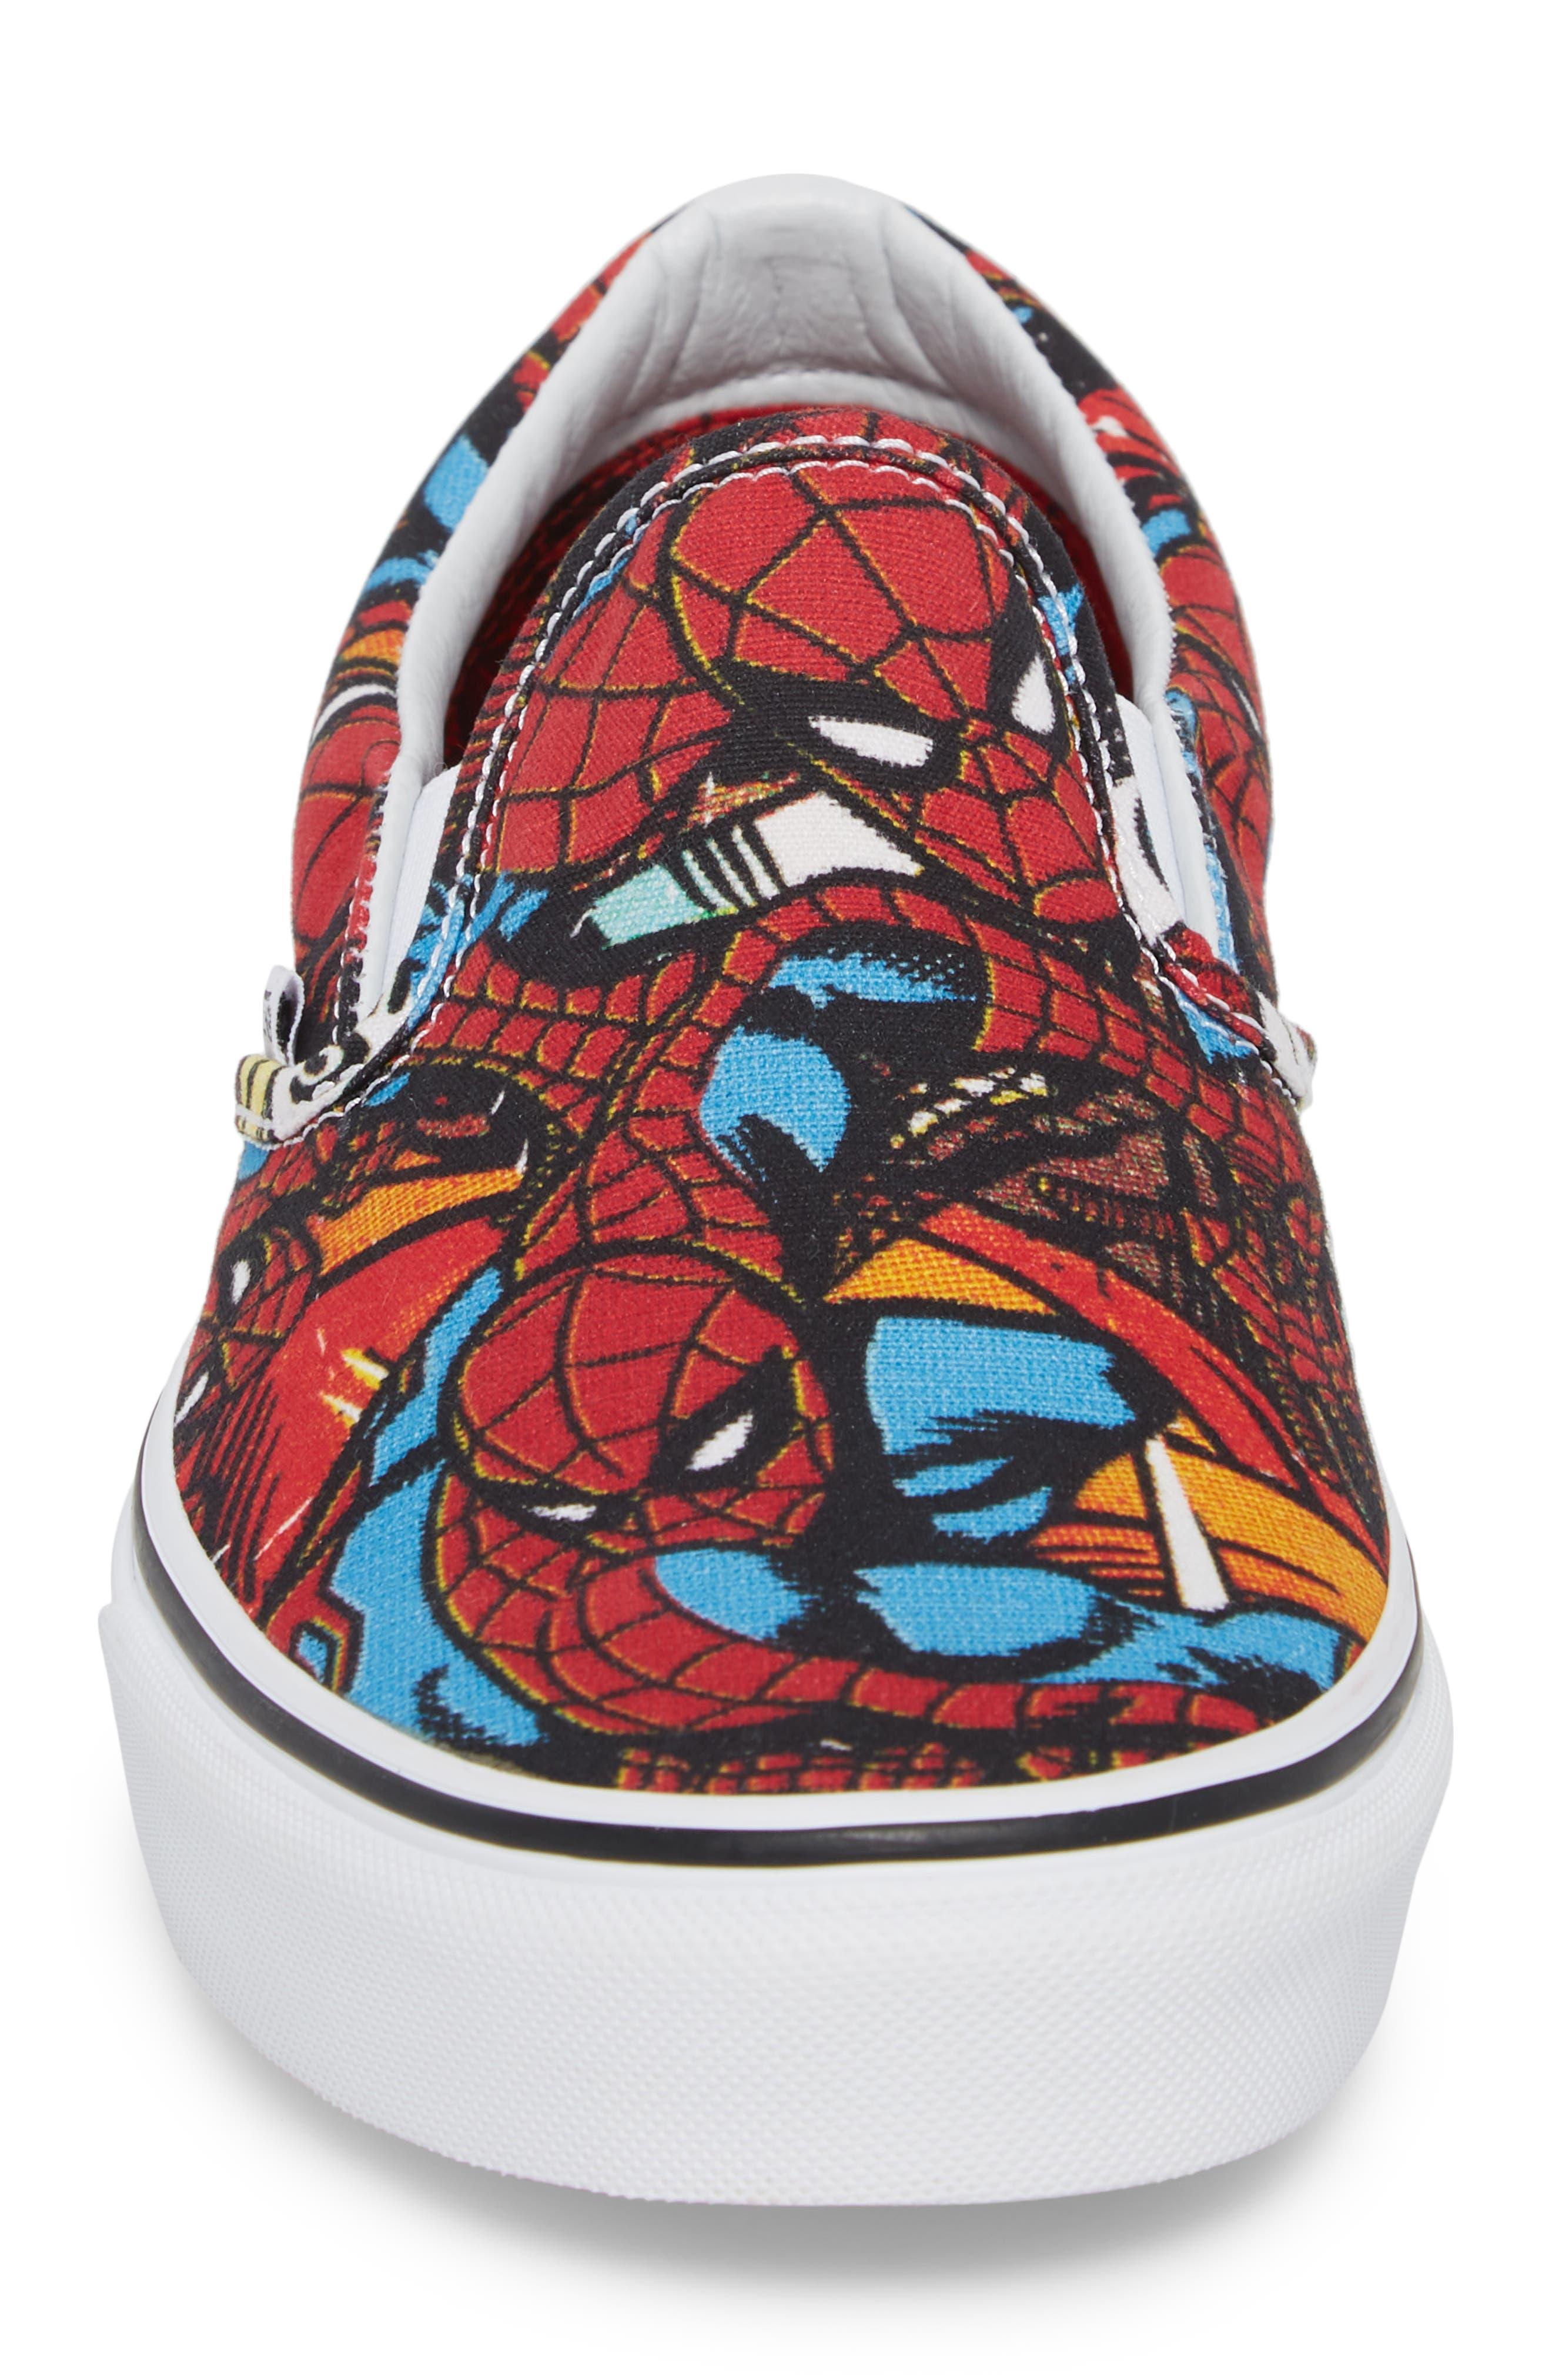 Marvel UA Classic Slip-On Sneaker,                             Alternate thumbnail 4, color,                             Black/ Red Textile